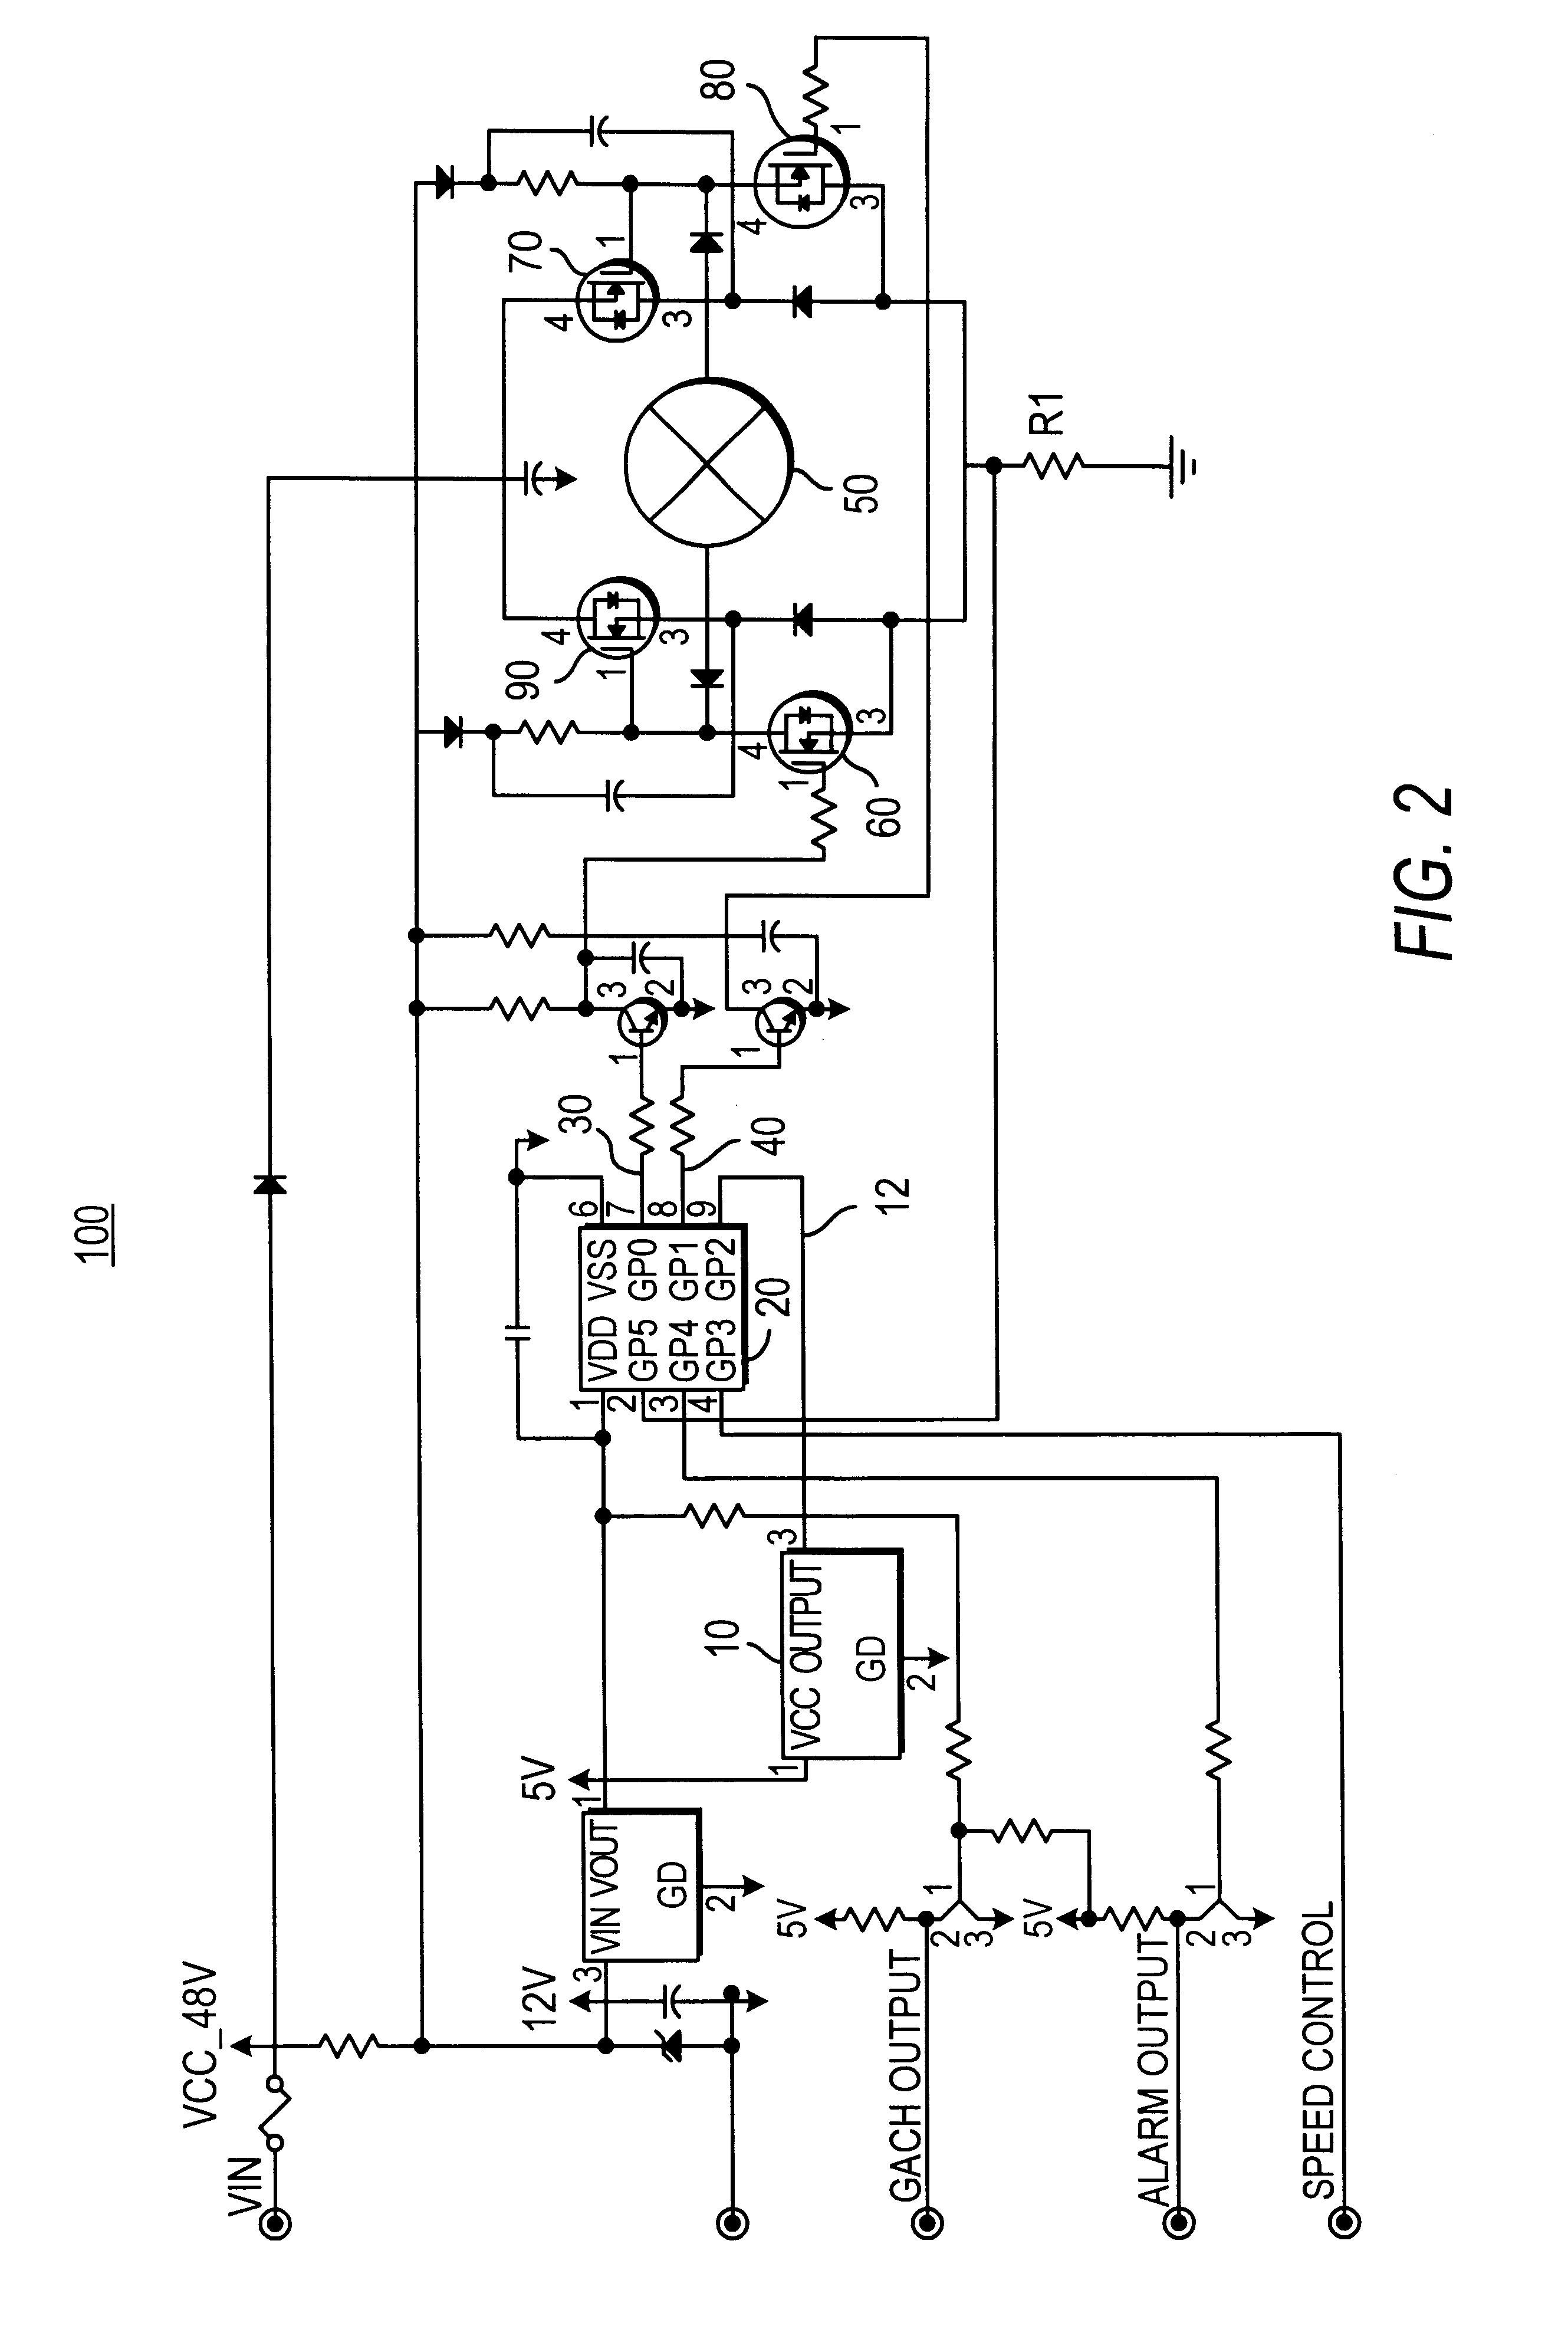 motor starter hand off auto wiring diagram wiring library Eaton Soft Starter Wiring Diagram It